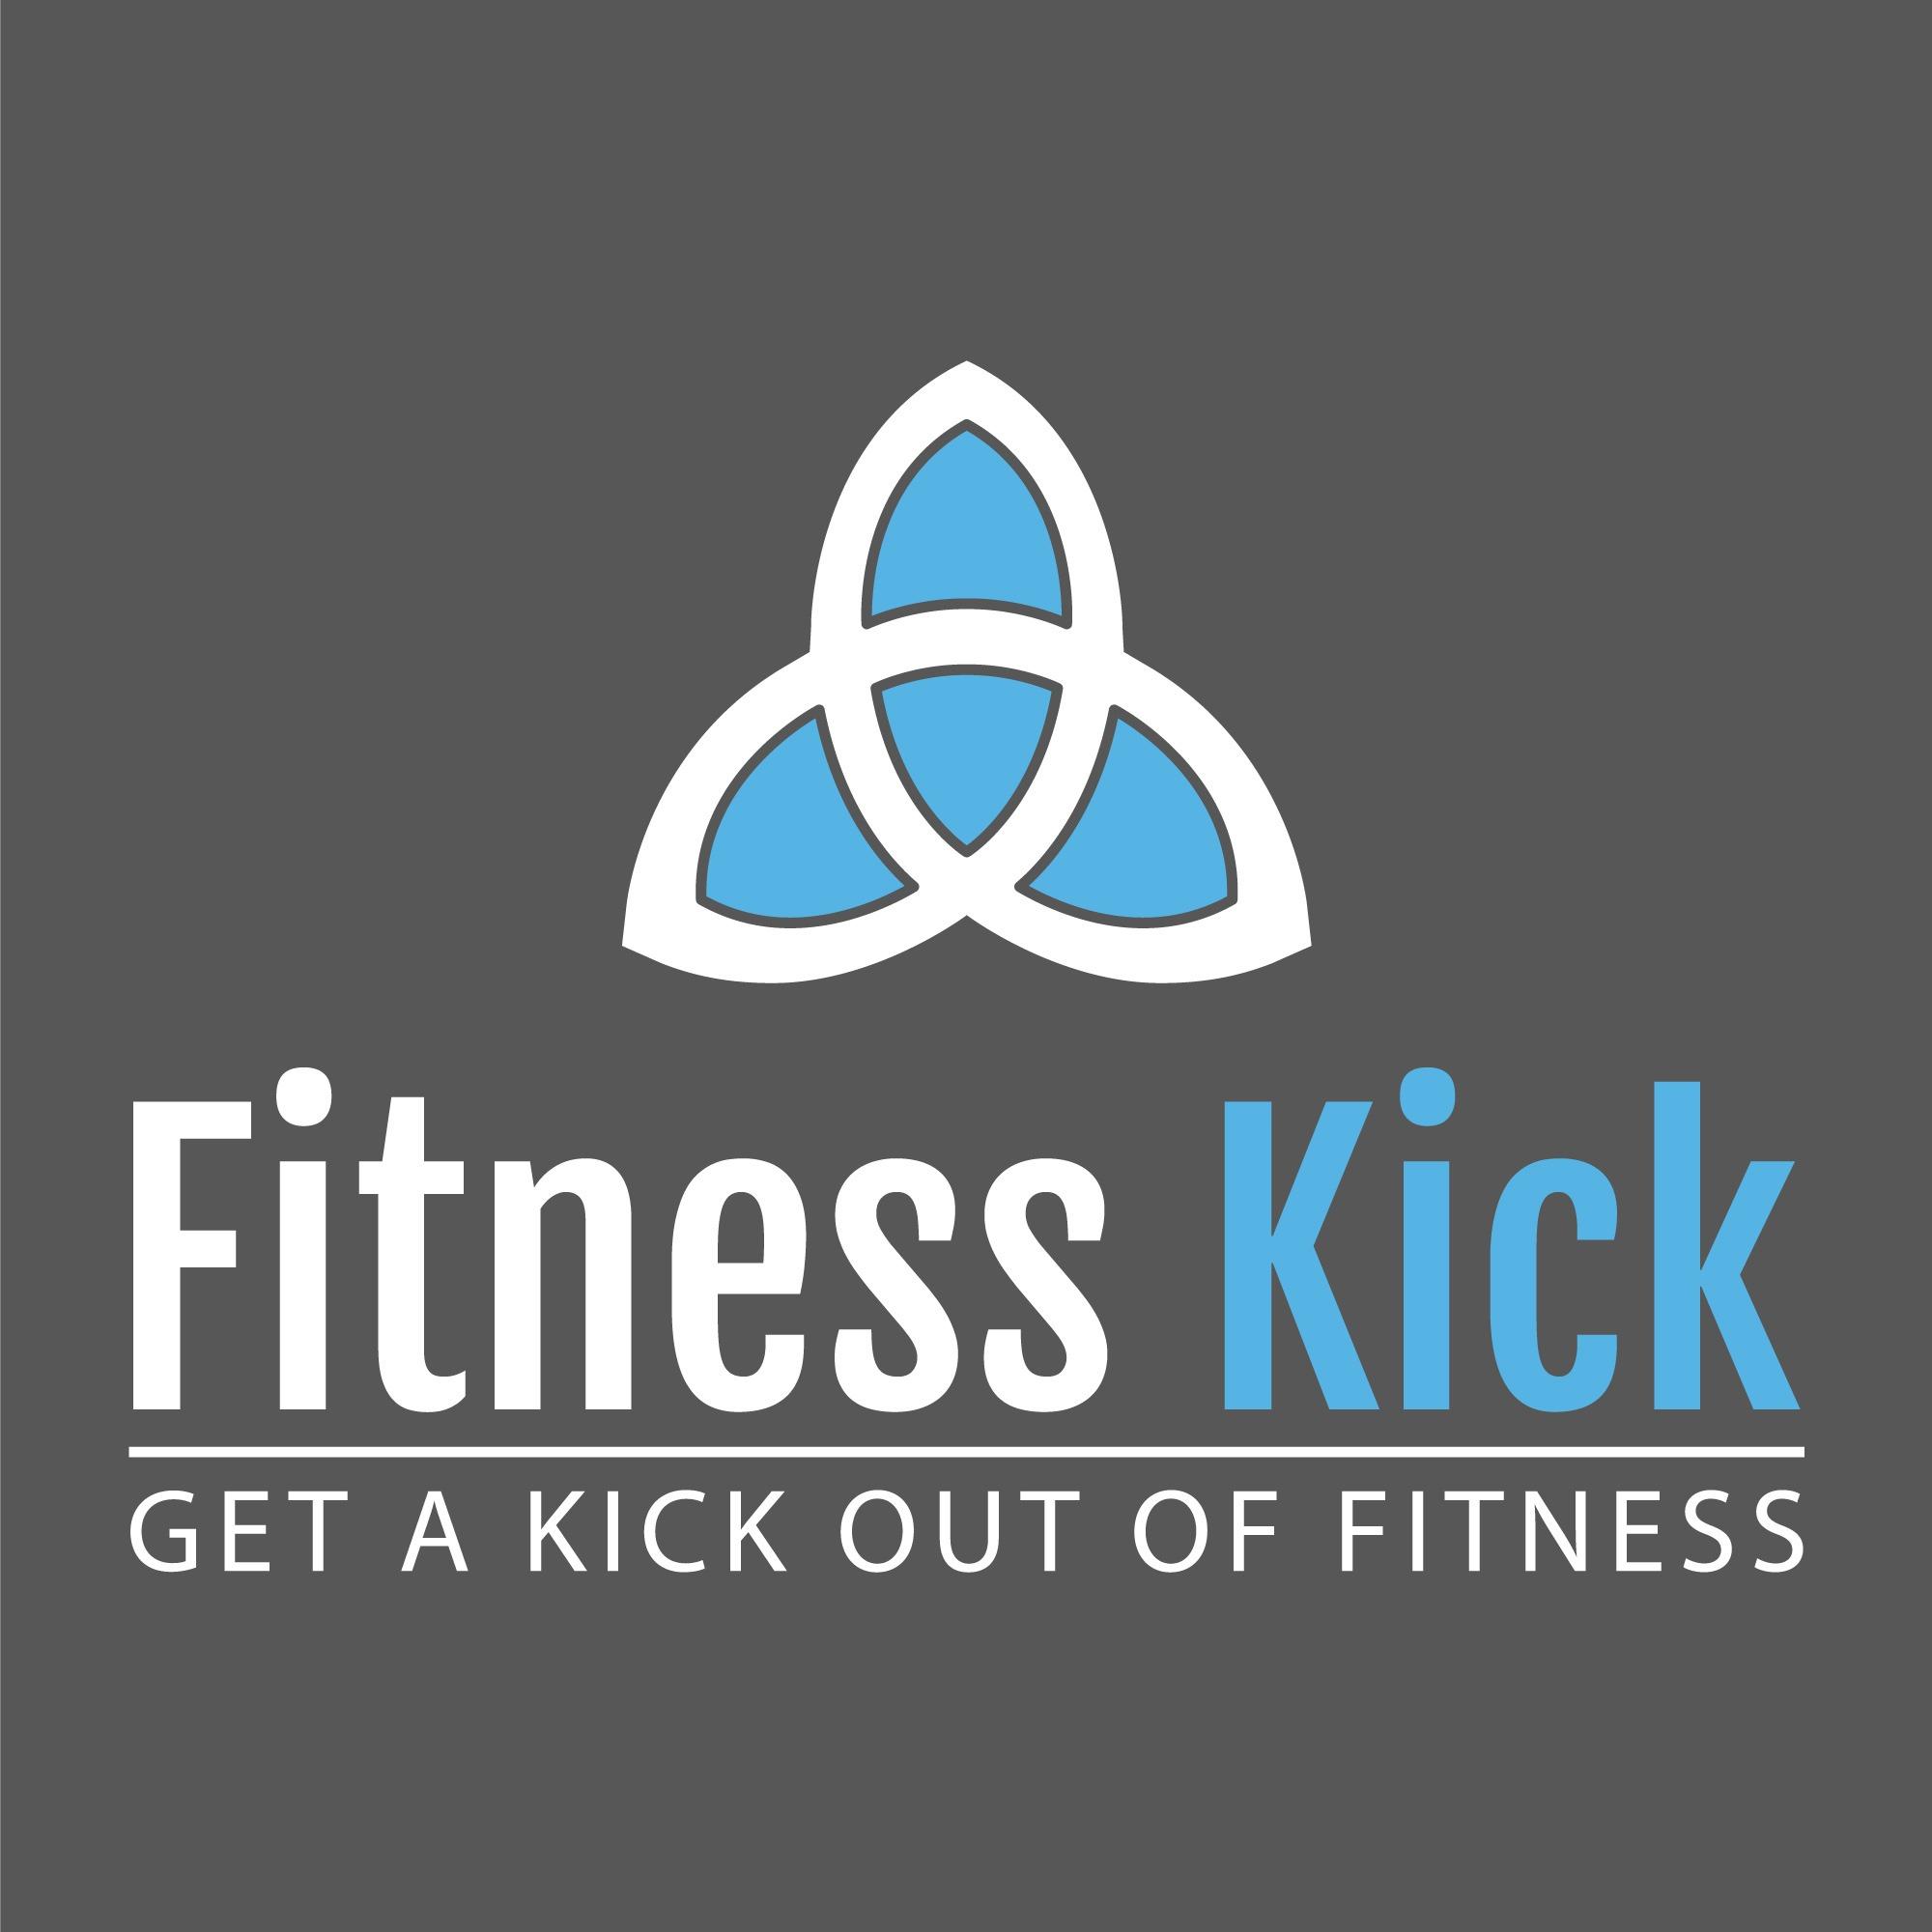 Fitness-kick_logo-2019